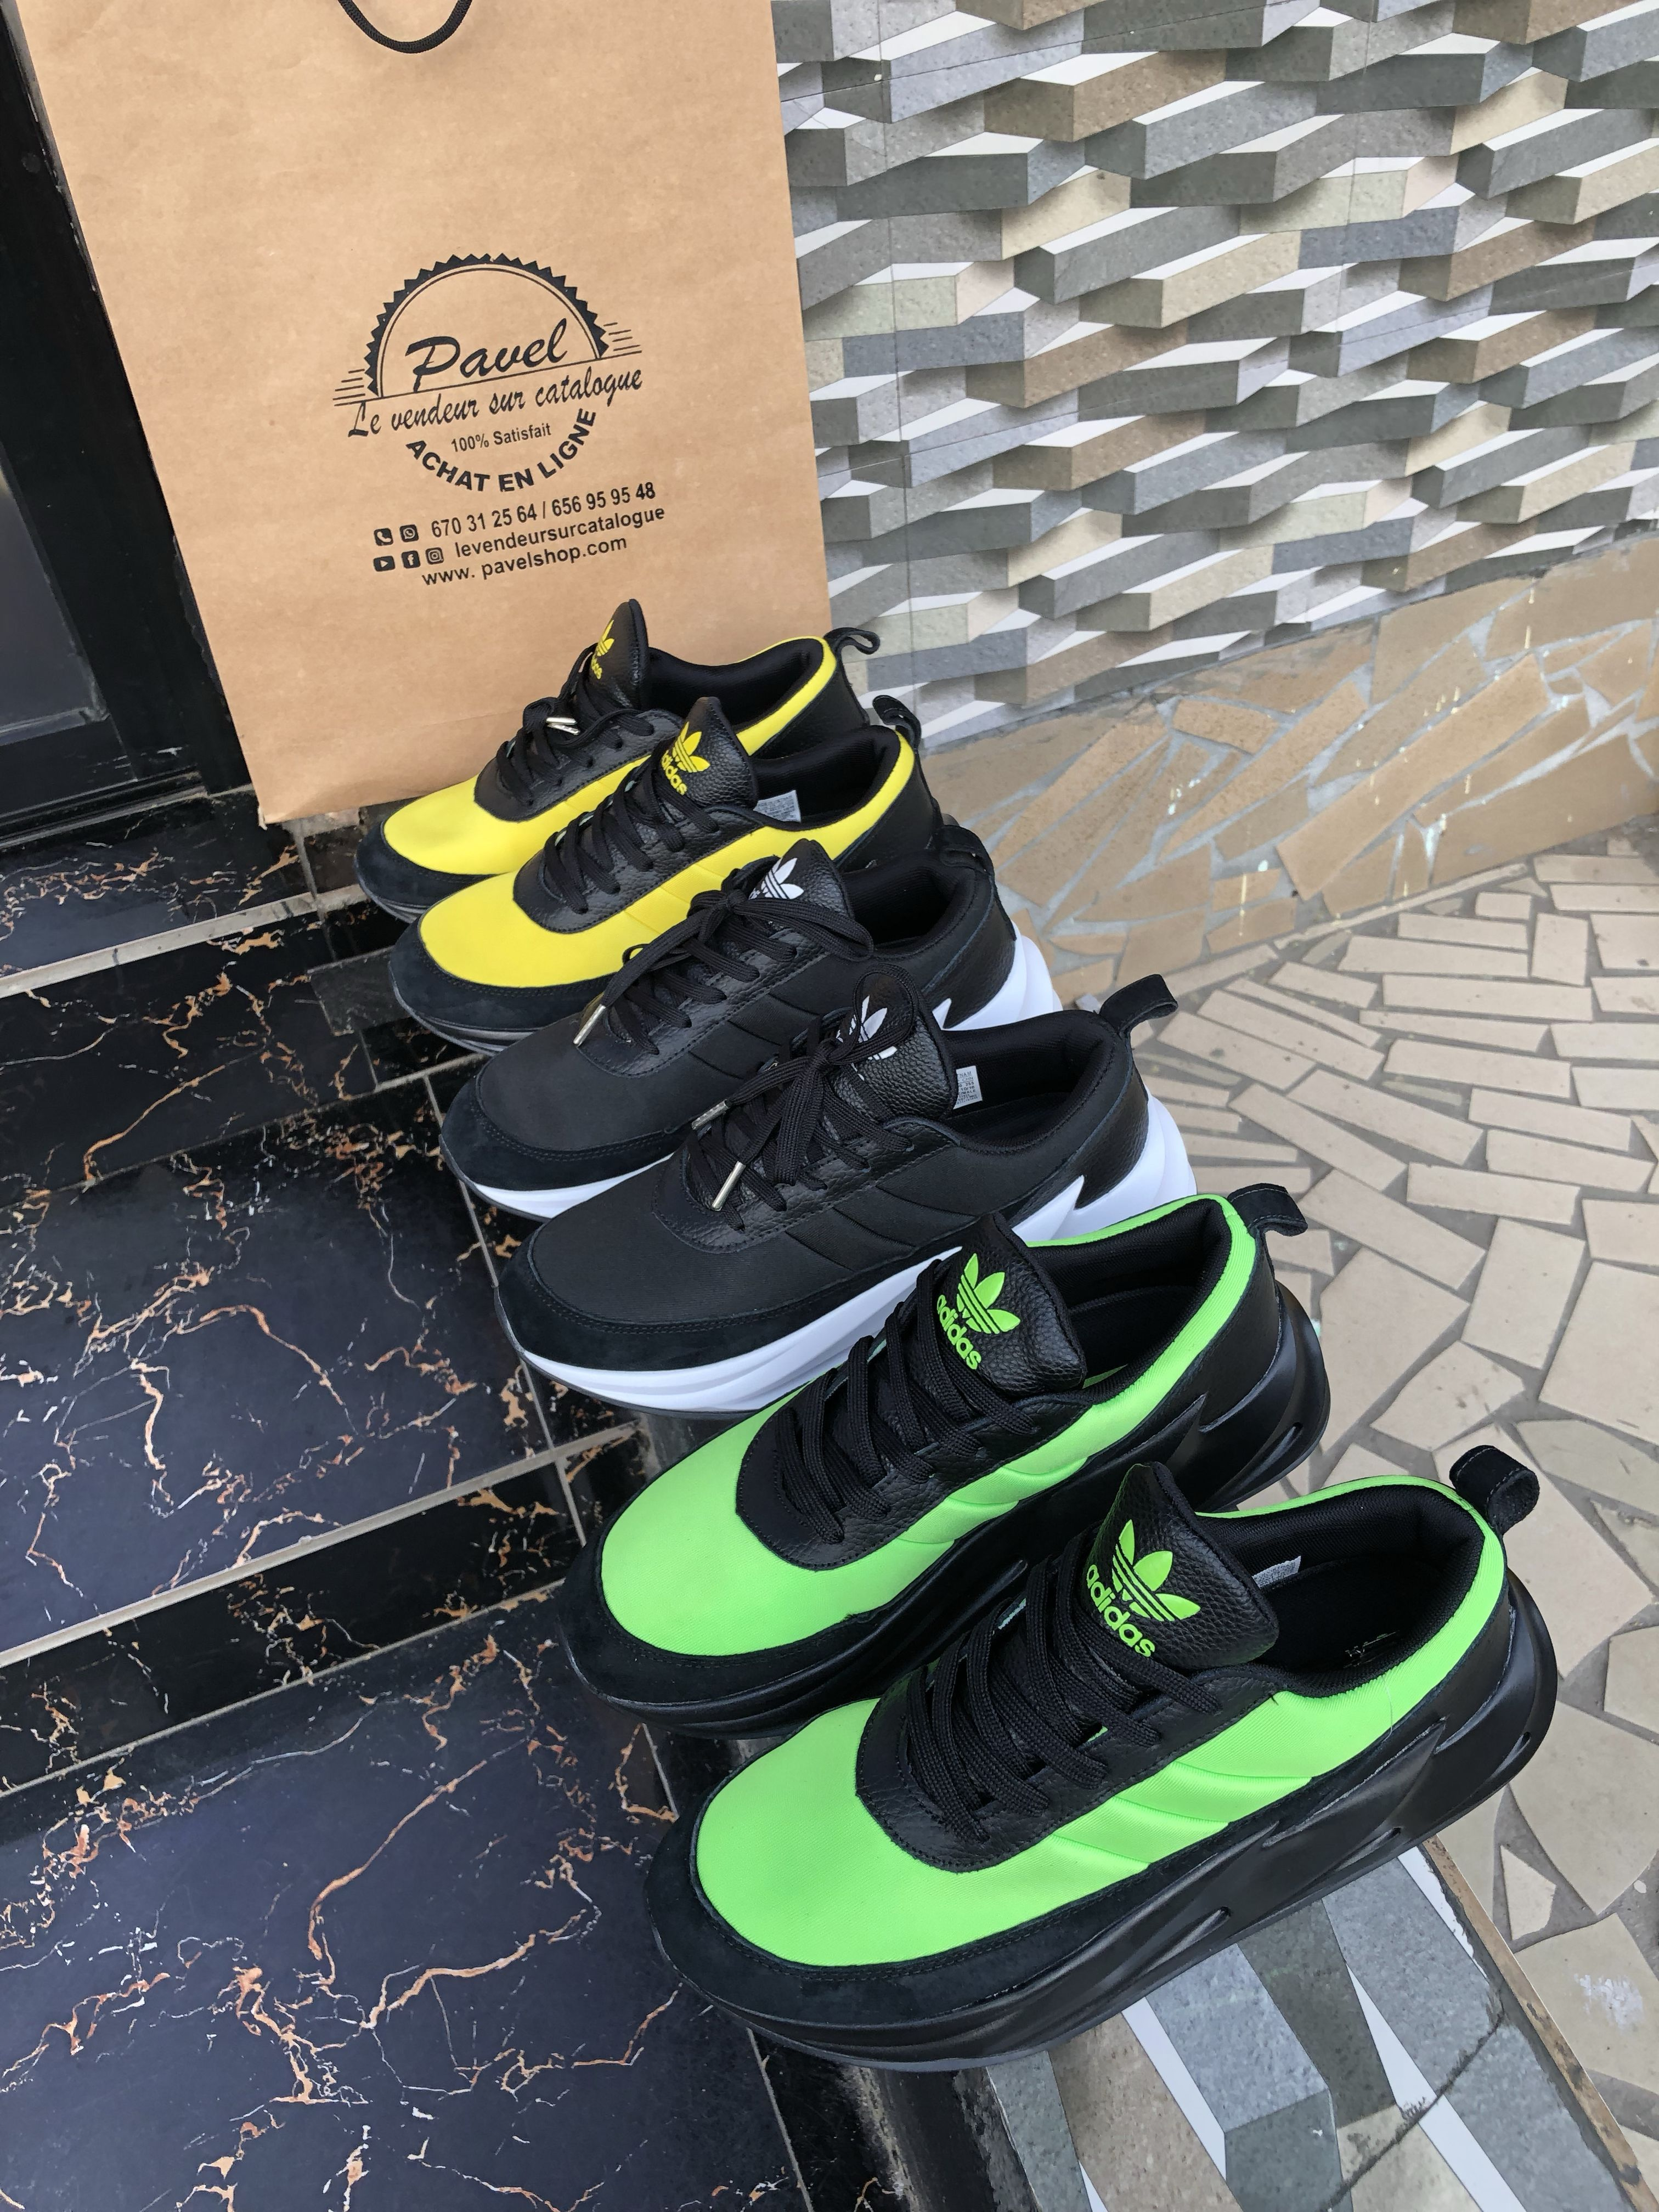 adidas shark boost shoes